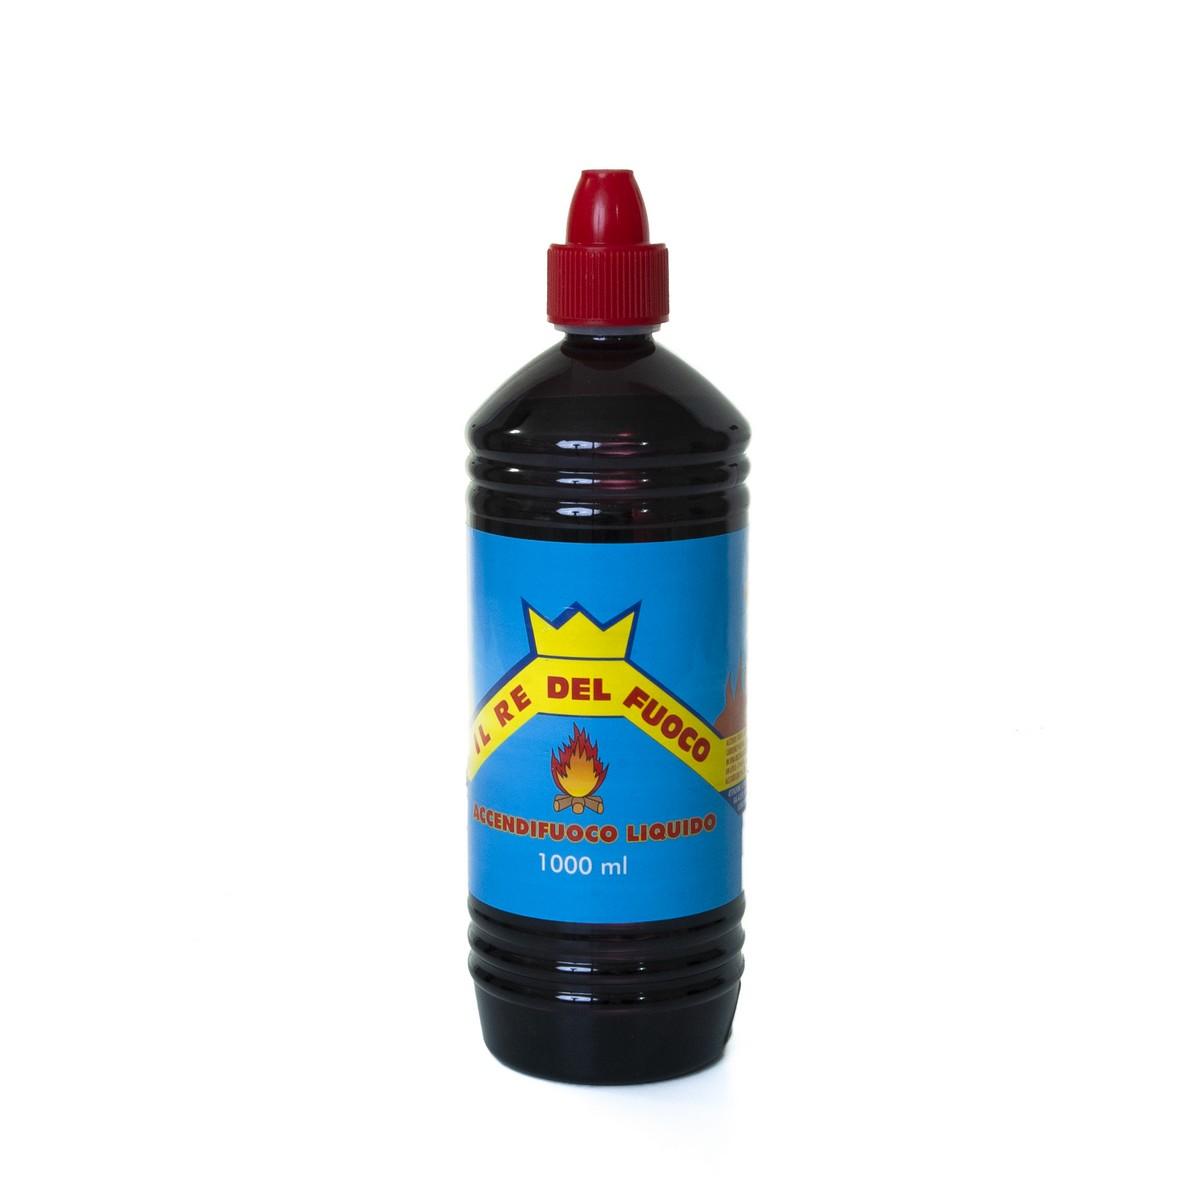 https://padovaniangelo.it/wp-content/uploads/2020/07/accendifuoco-liquido-1litro.jpg